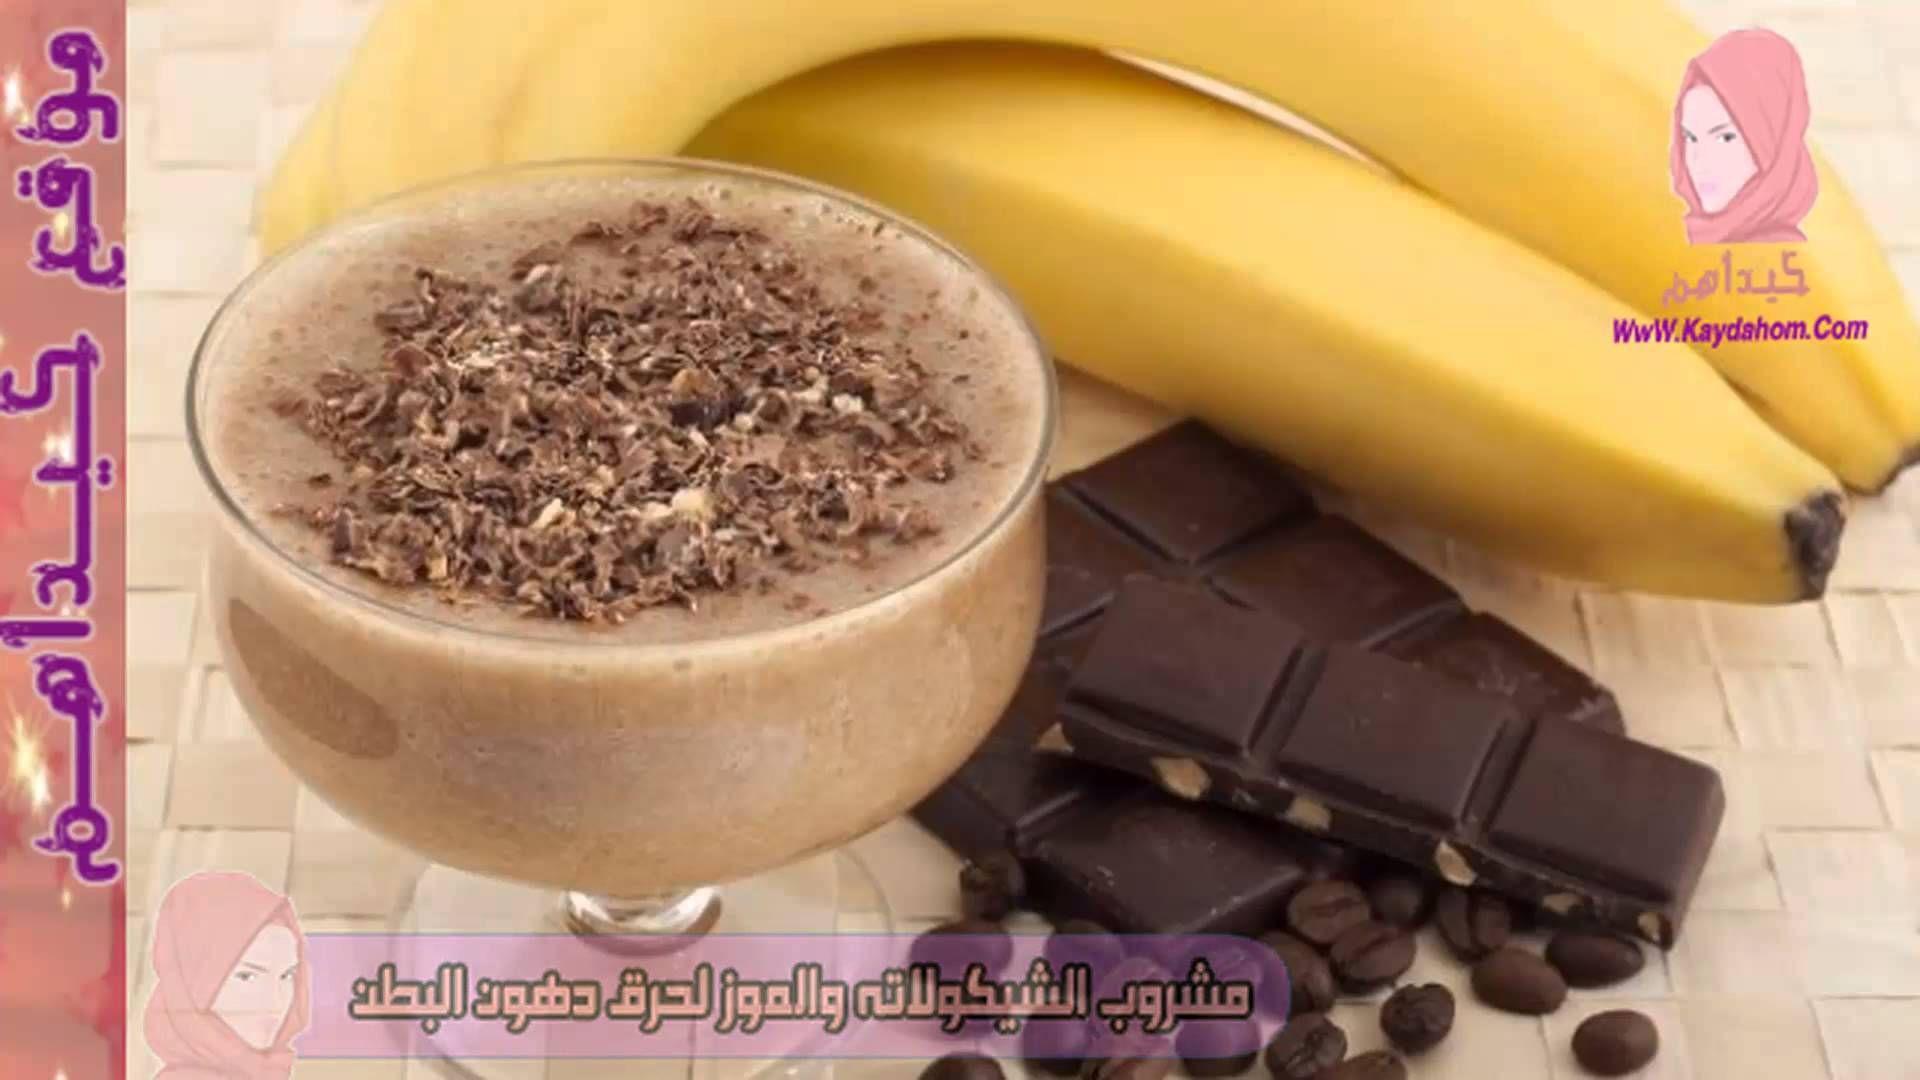 مشروب الشيكولاته والموز لحرق دهون البطن Hd Healthy Breakfast Smoothies Chocolate Banana Smoothie Chocolate Smoothie